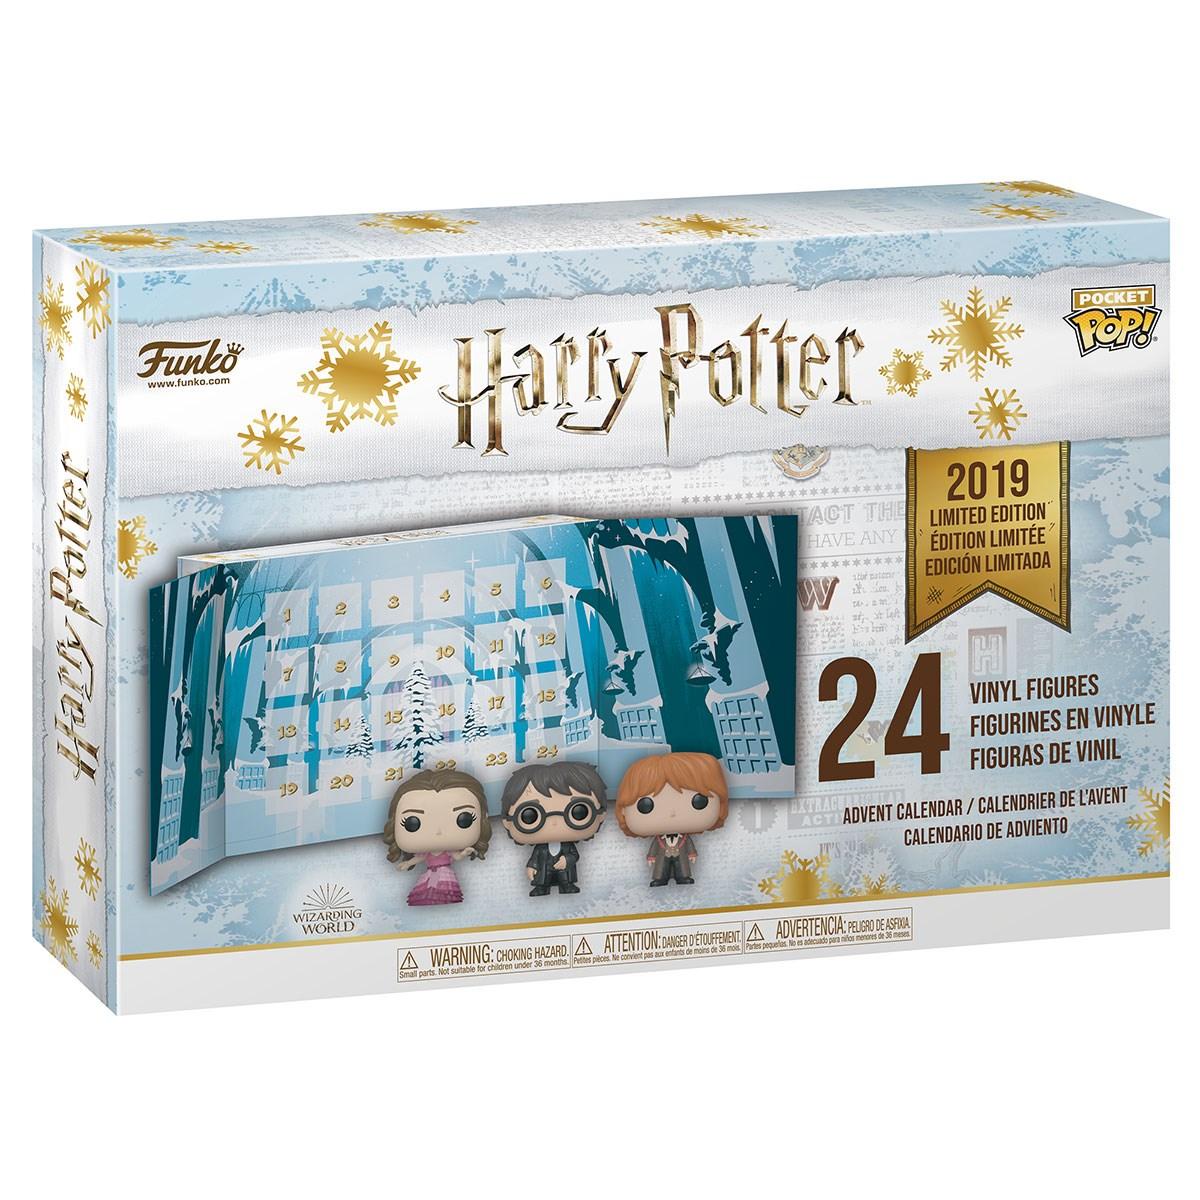 Funko POP! Harry Potter Advent Calendar (Limited Edition Yuleball 2019) - £35.99 - Zoom